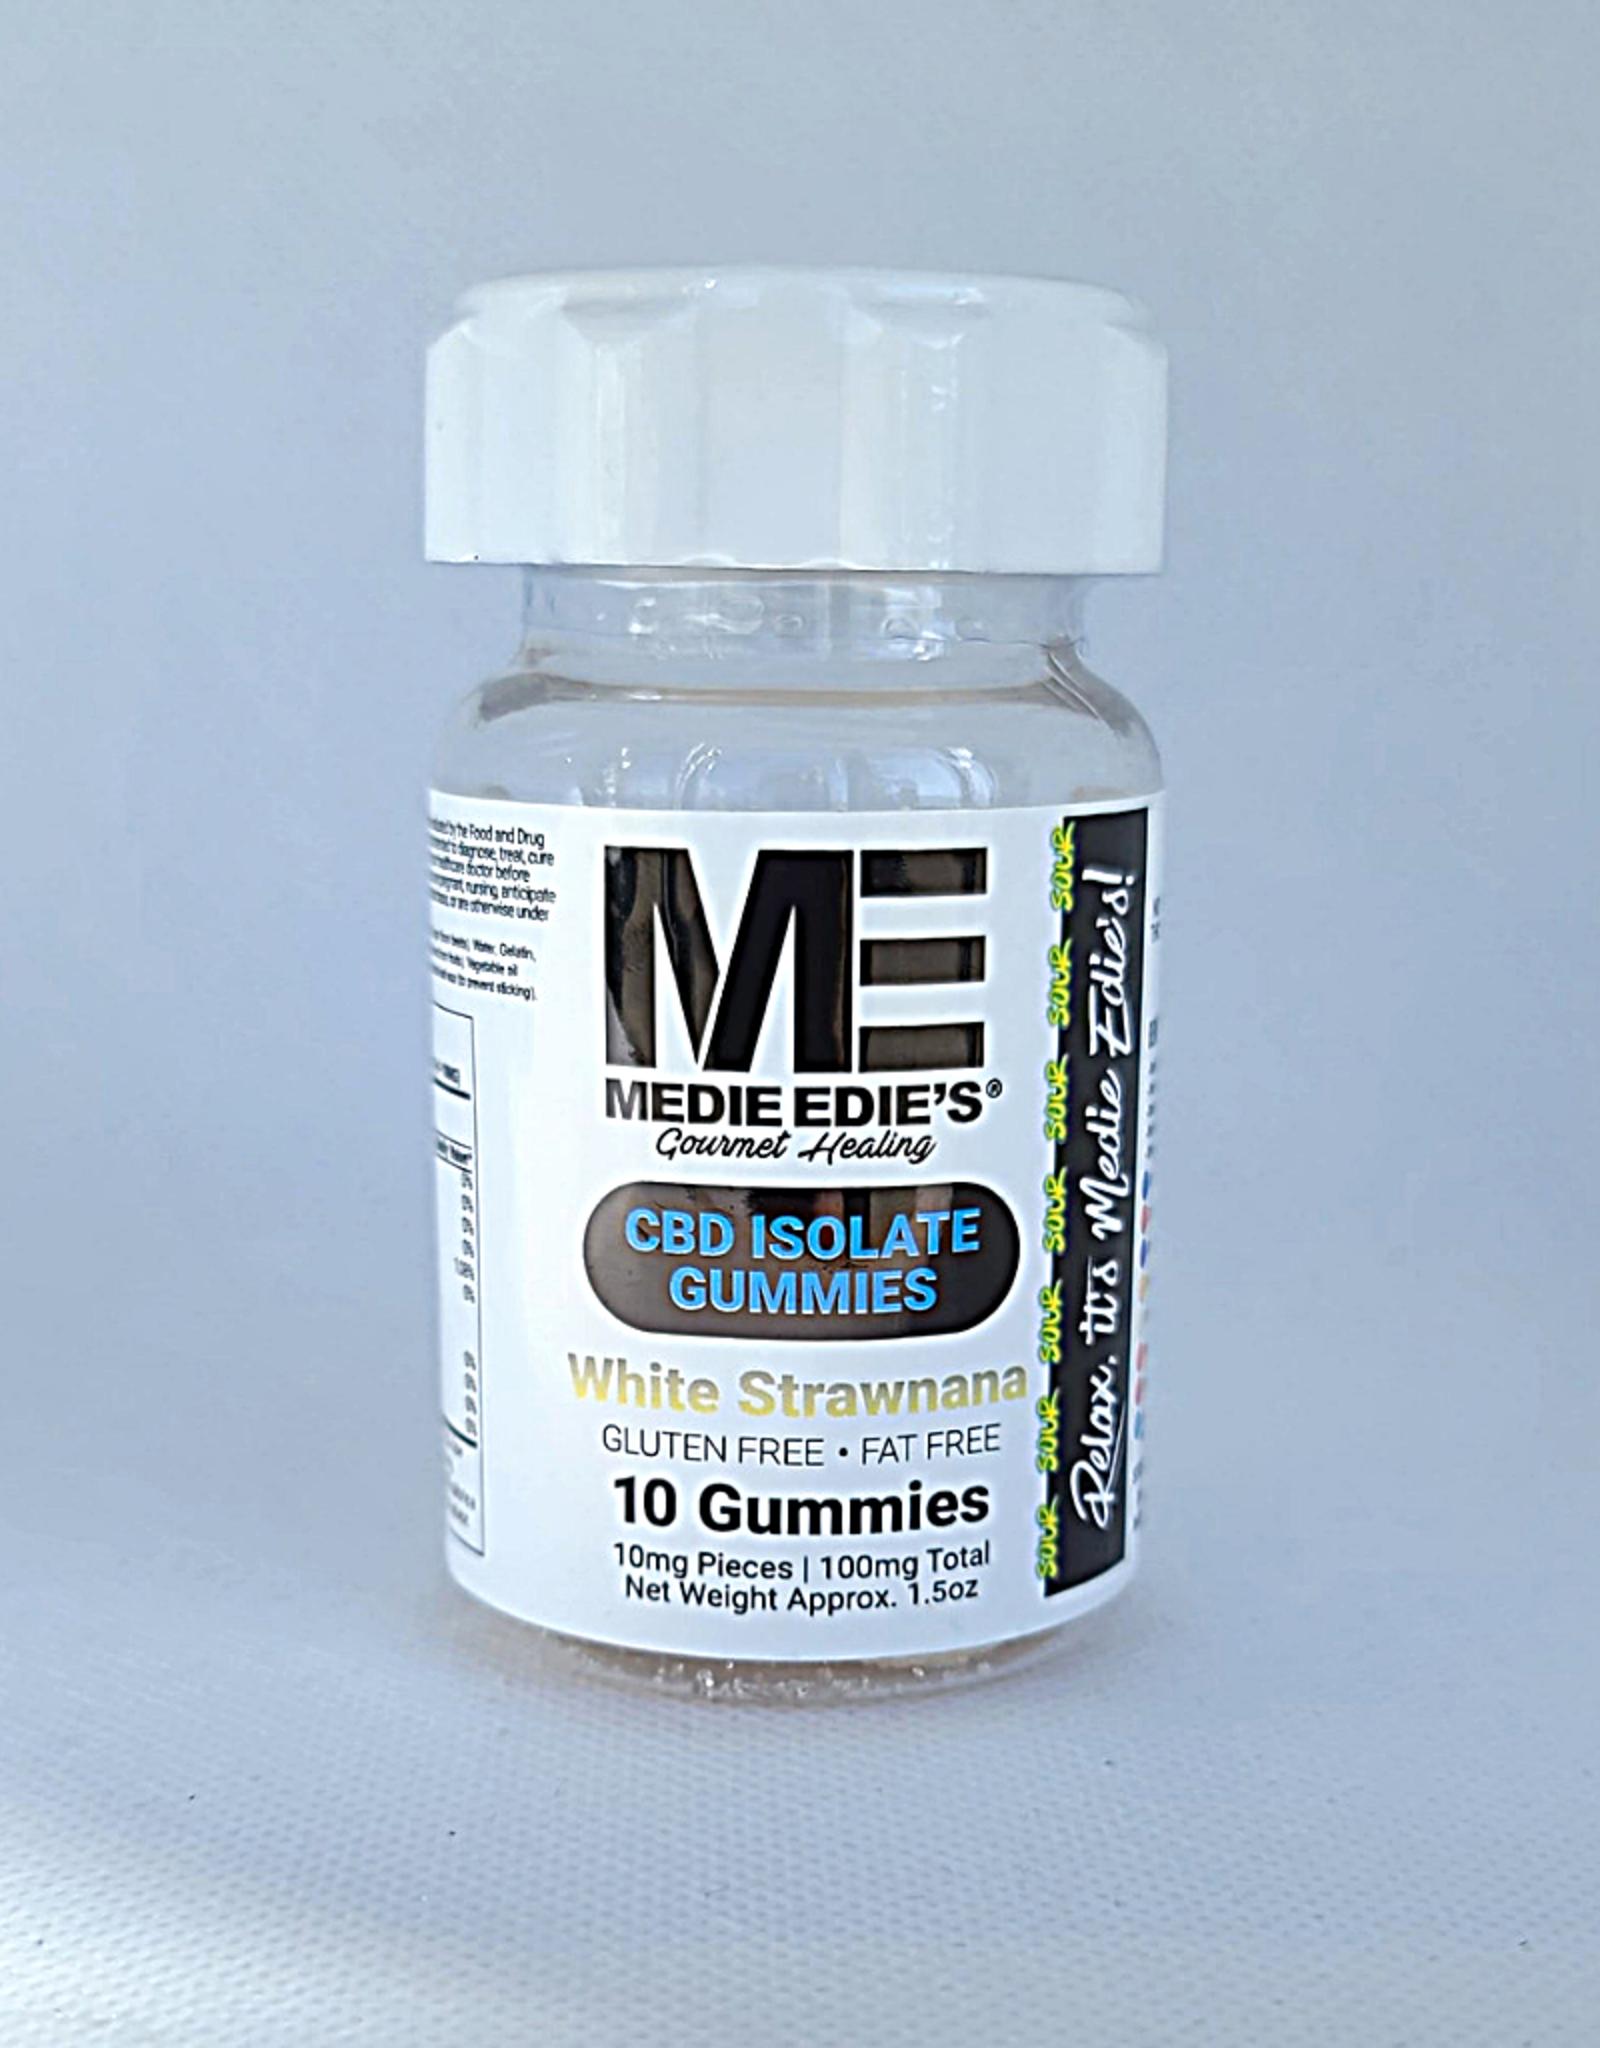 Medie Edie's Sour Red Raspberry CBD Gummies - 10ct/10mg/100mg